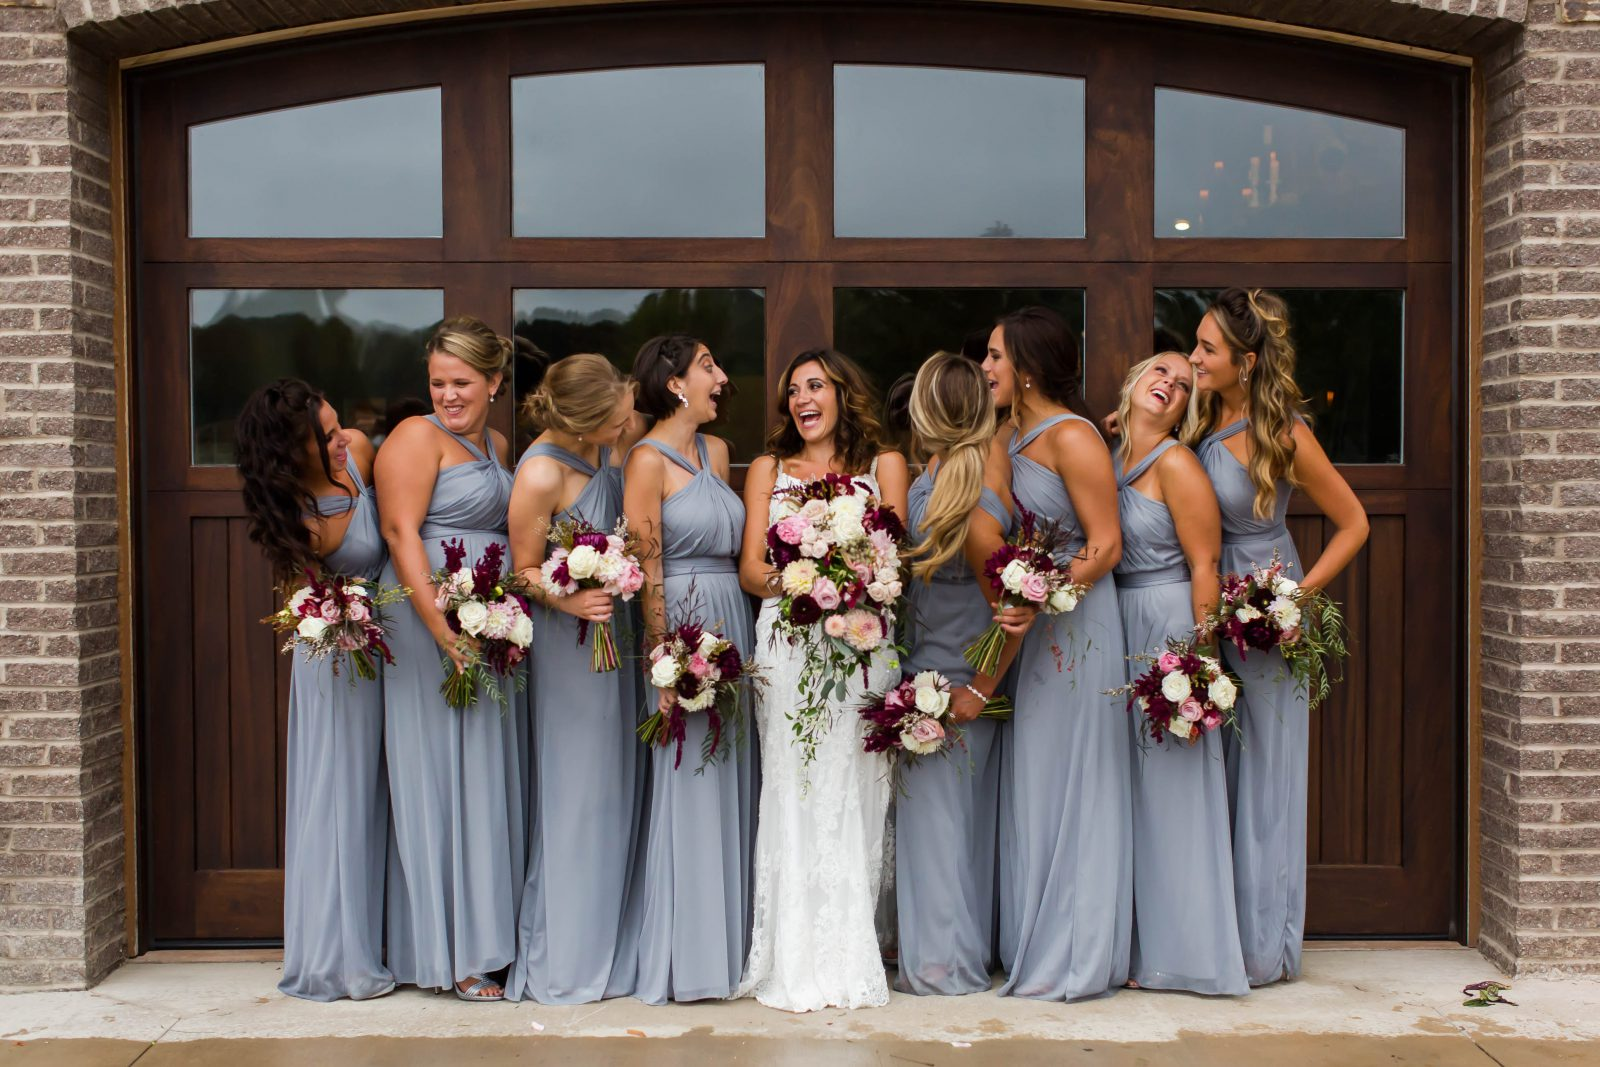 sunny-hill-wedding-venue-loren-jackson-photography-44